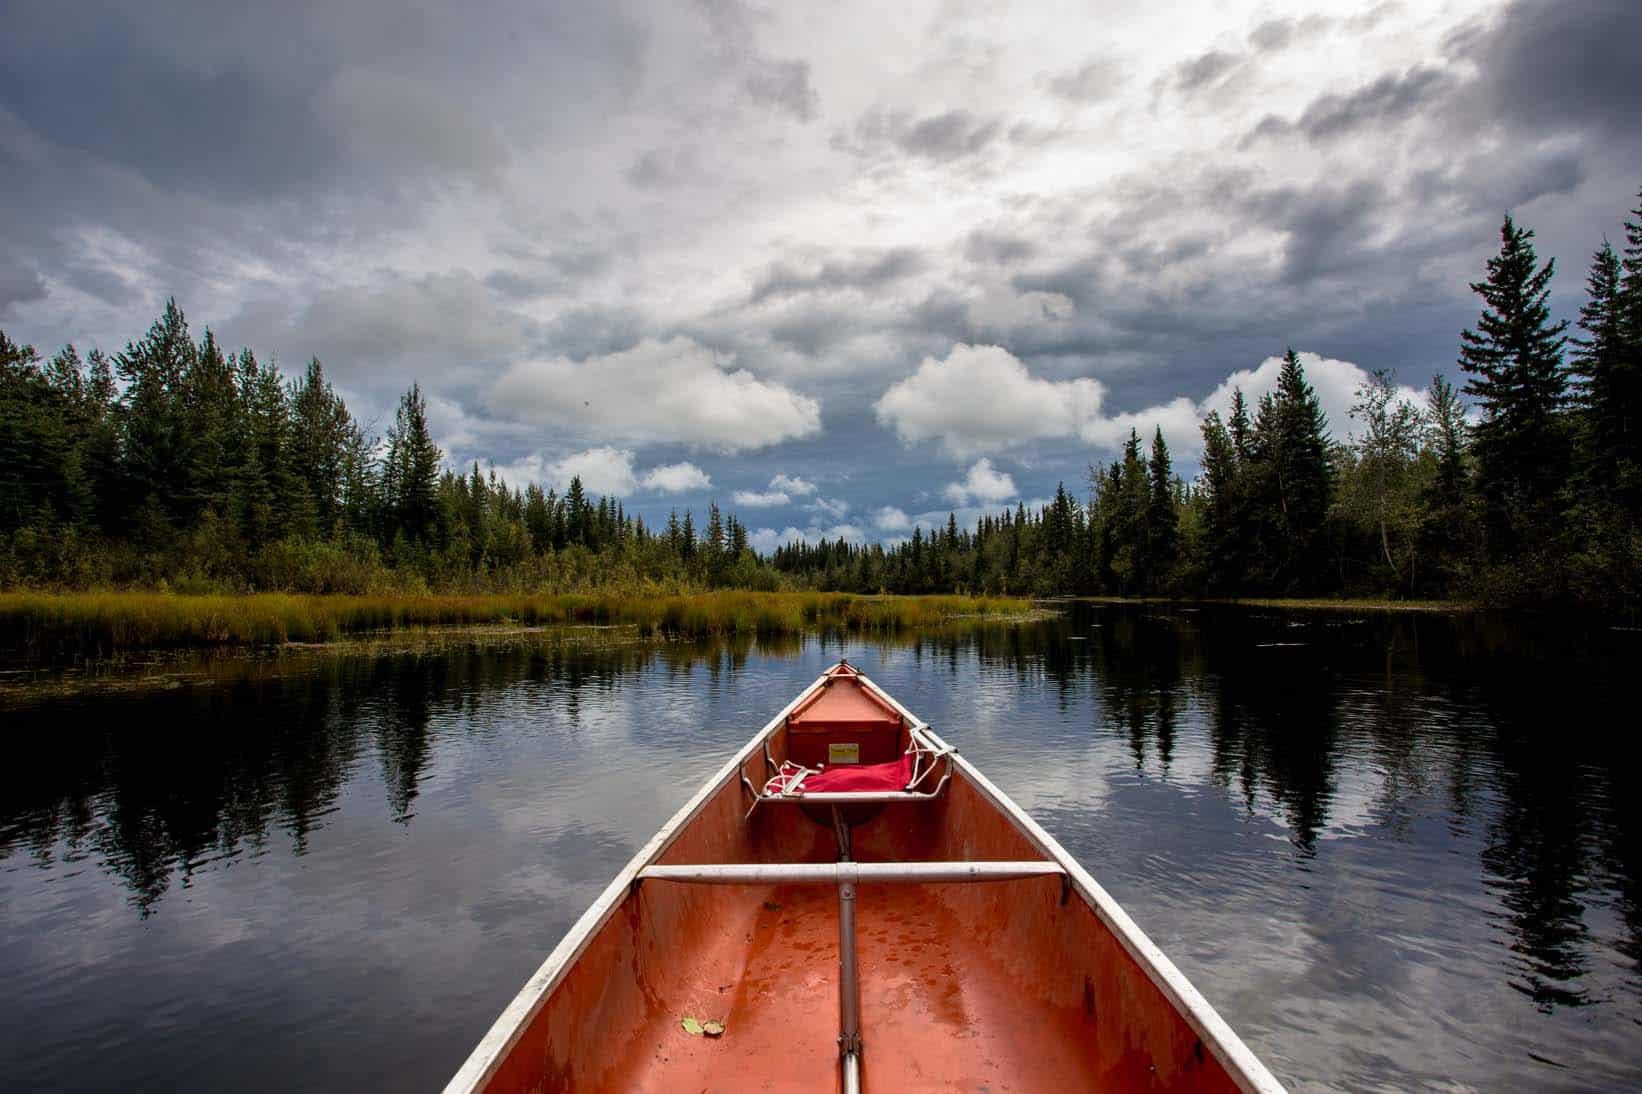 Alaska Day 9: North Pole and Chena Slough